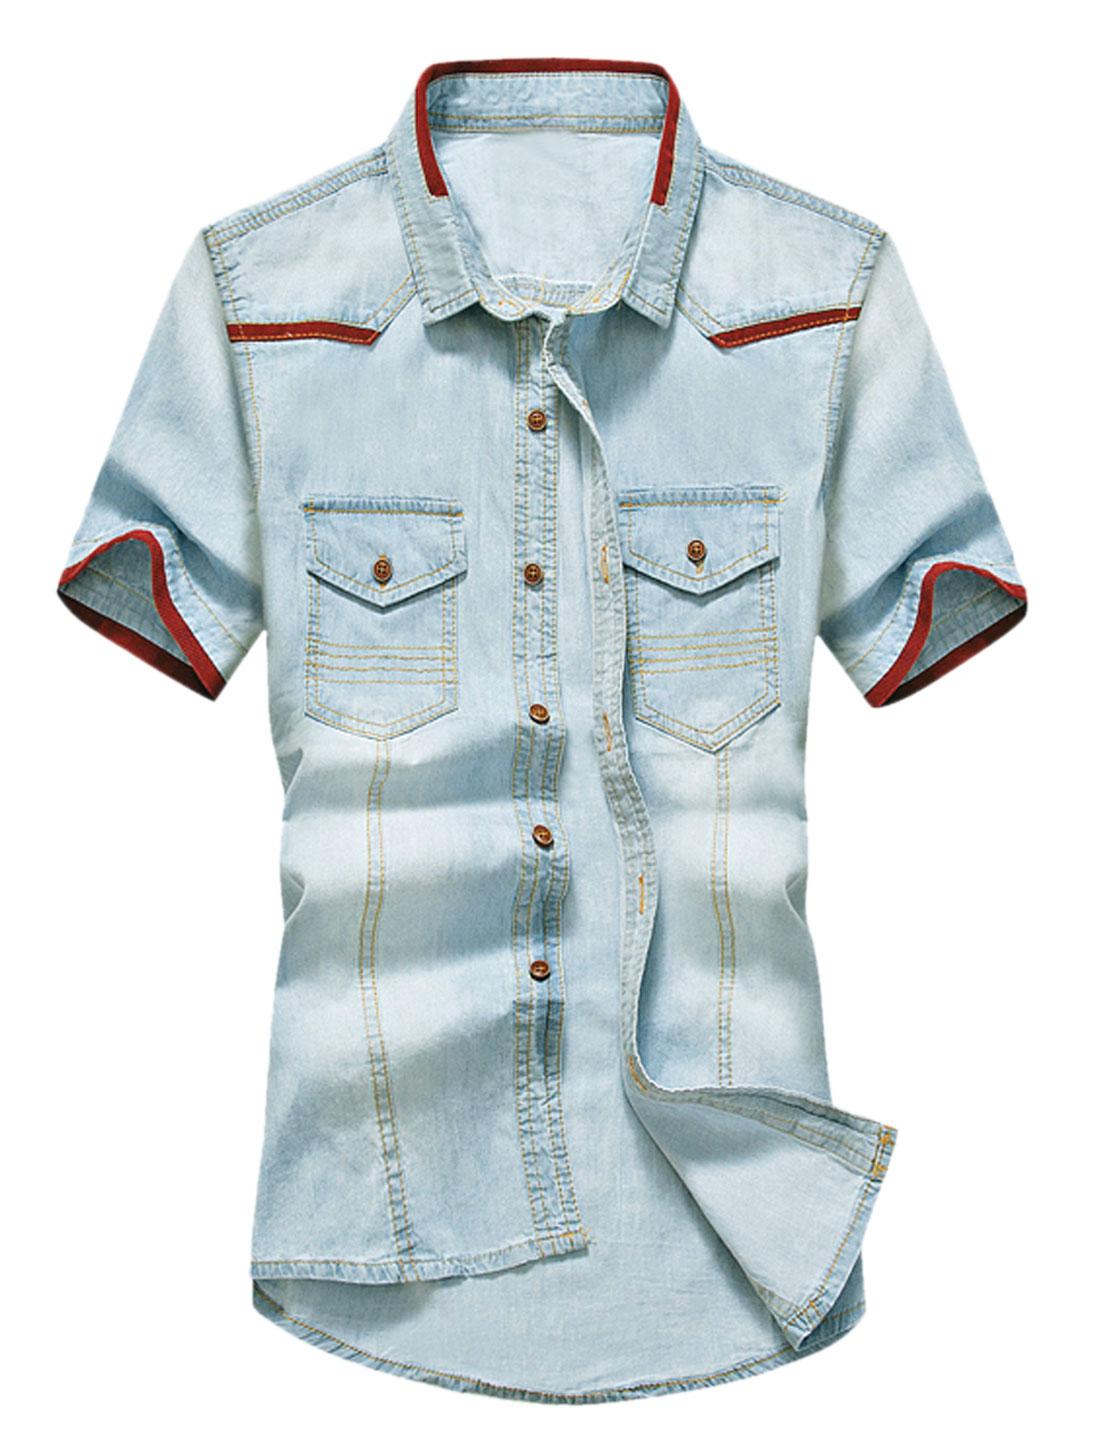 Men Flap Chest Pockets Short Sleeves Panel Denim Shirt Light Blue Burgundy M